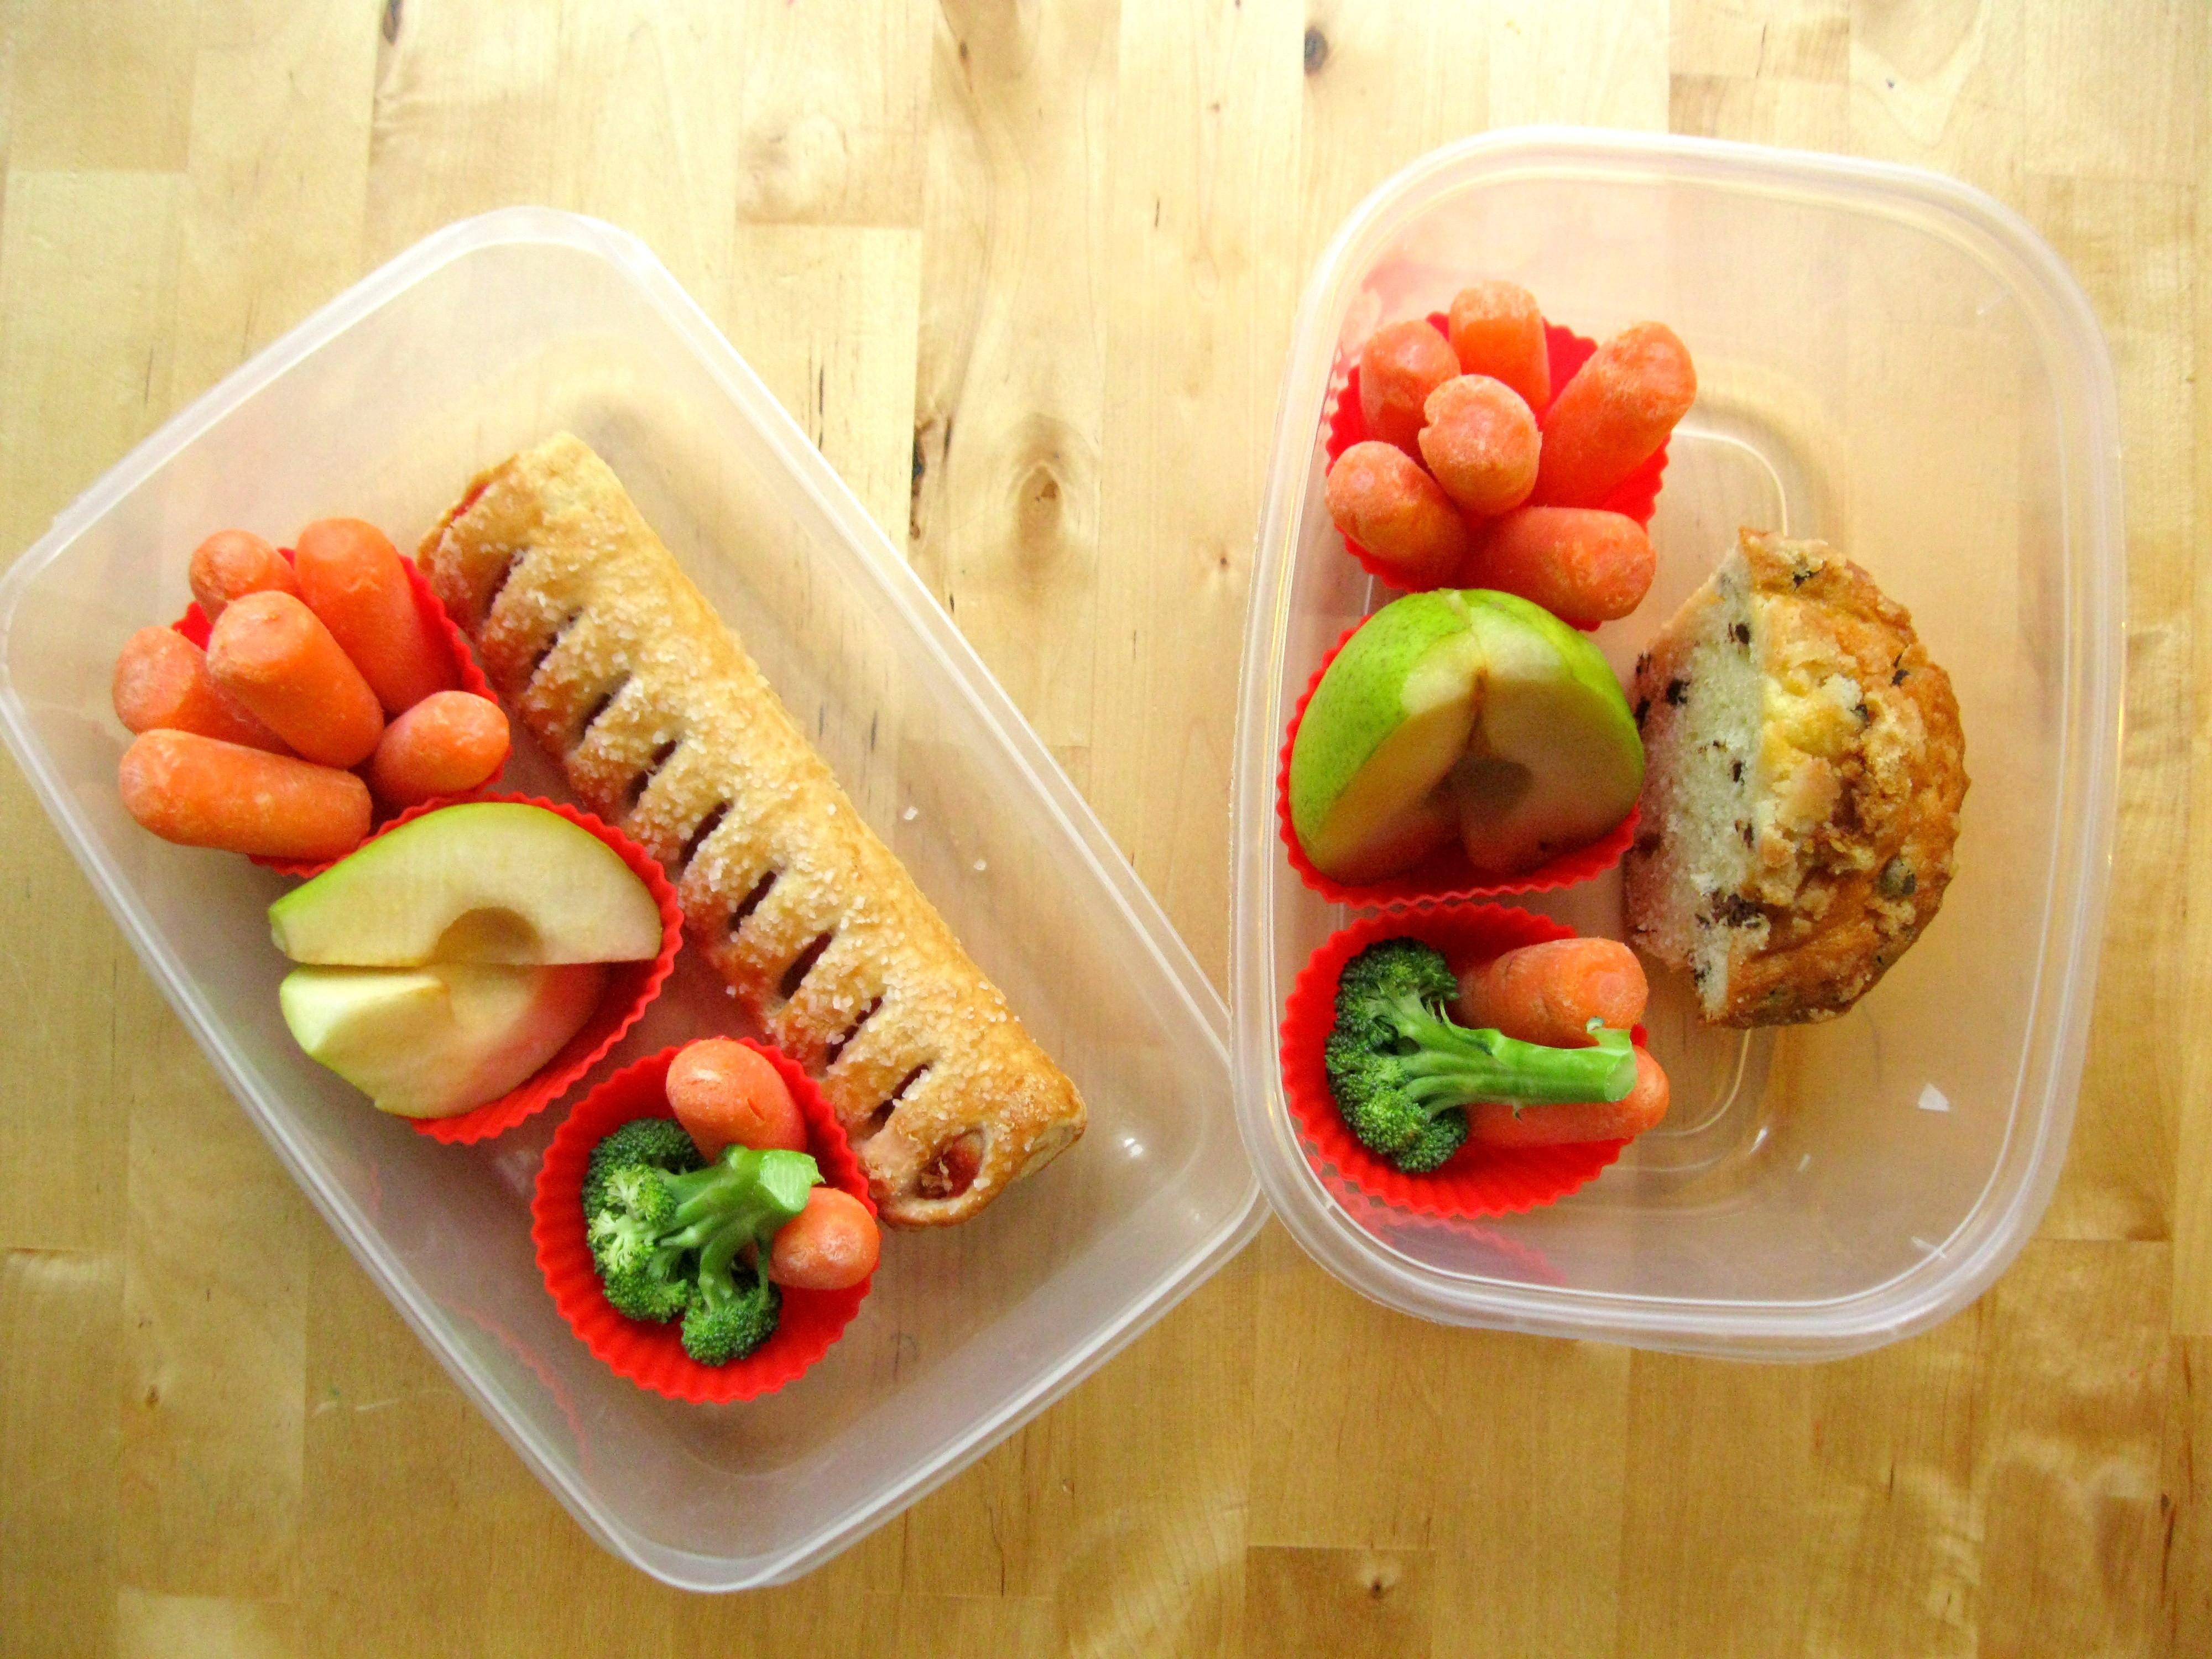 Very Healthy Snacks  Top 30 Healthy Snacks For Kids